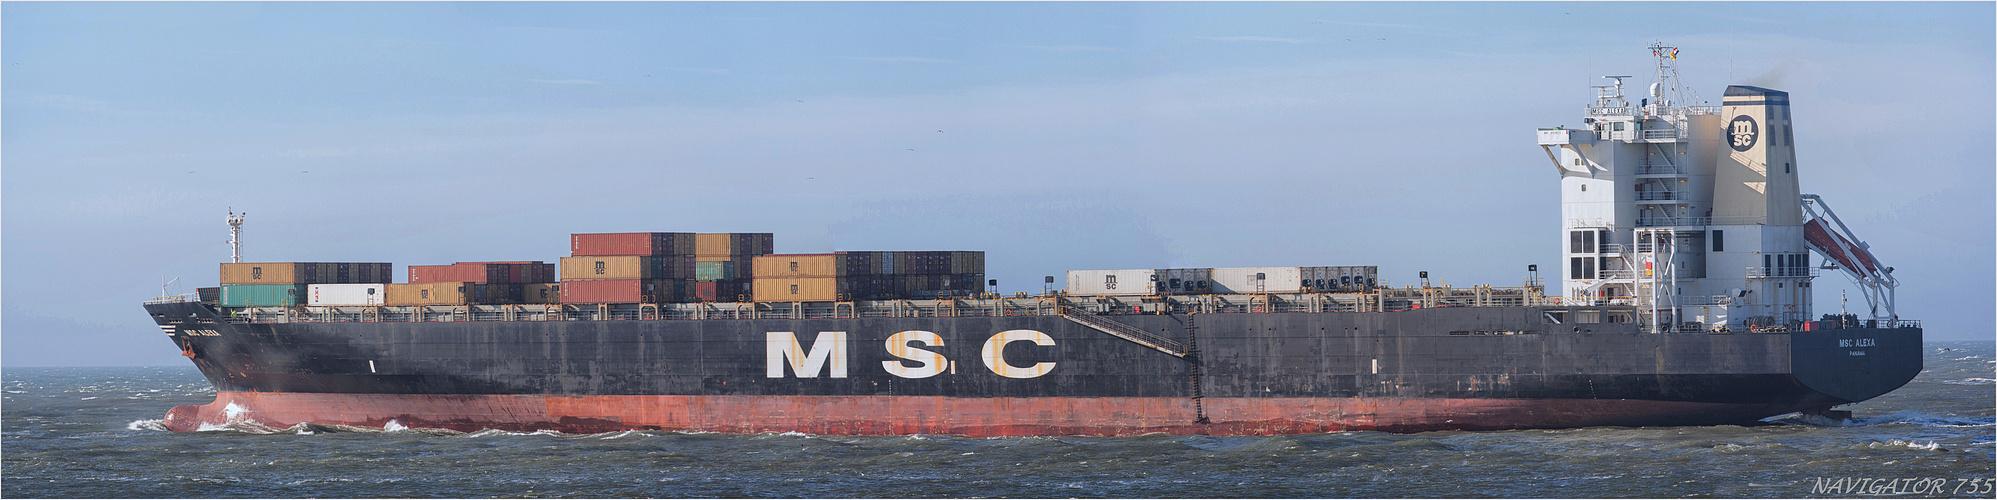 MCS Alexa / Containership / Rotterdam / 23.10.2013 /  Bitte scrollen!